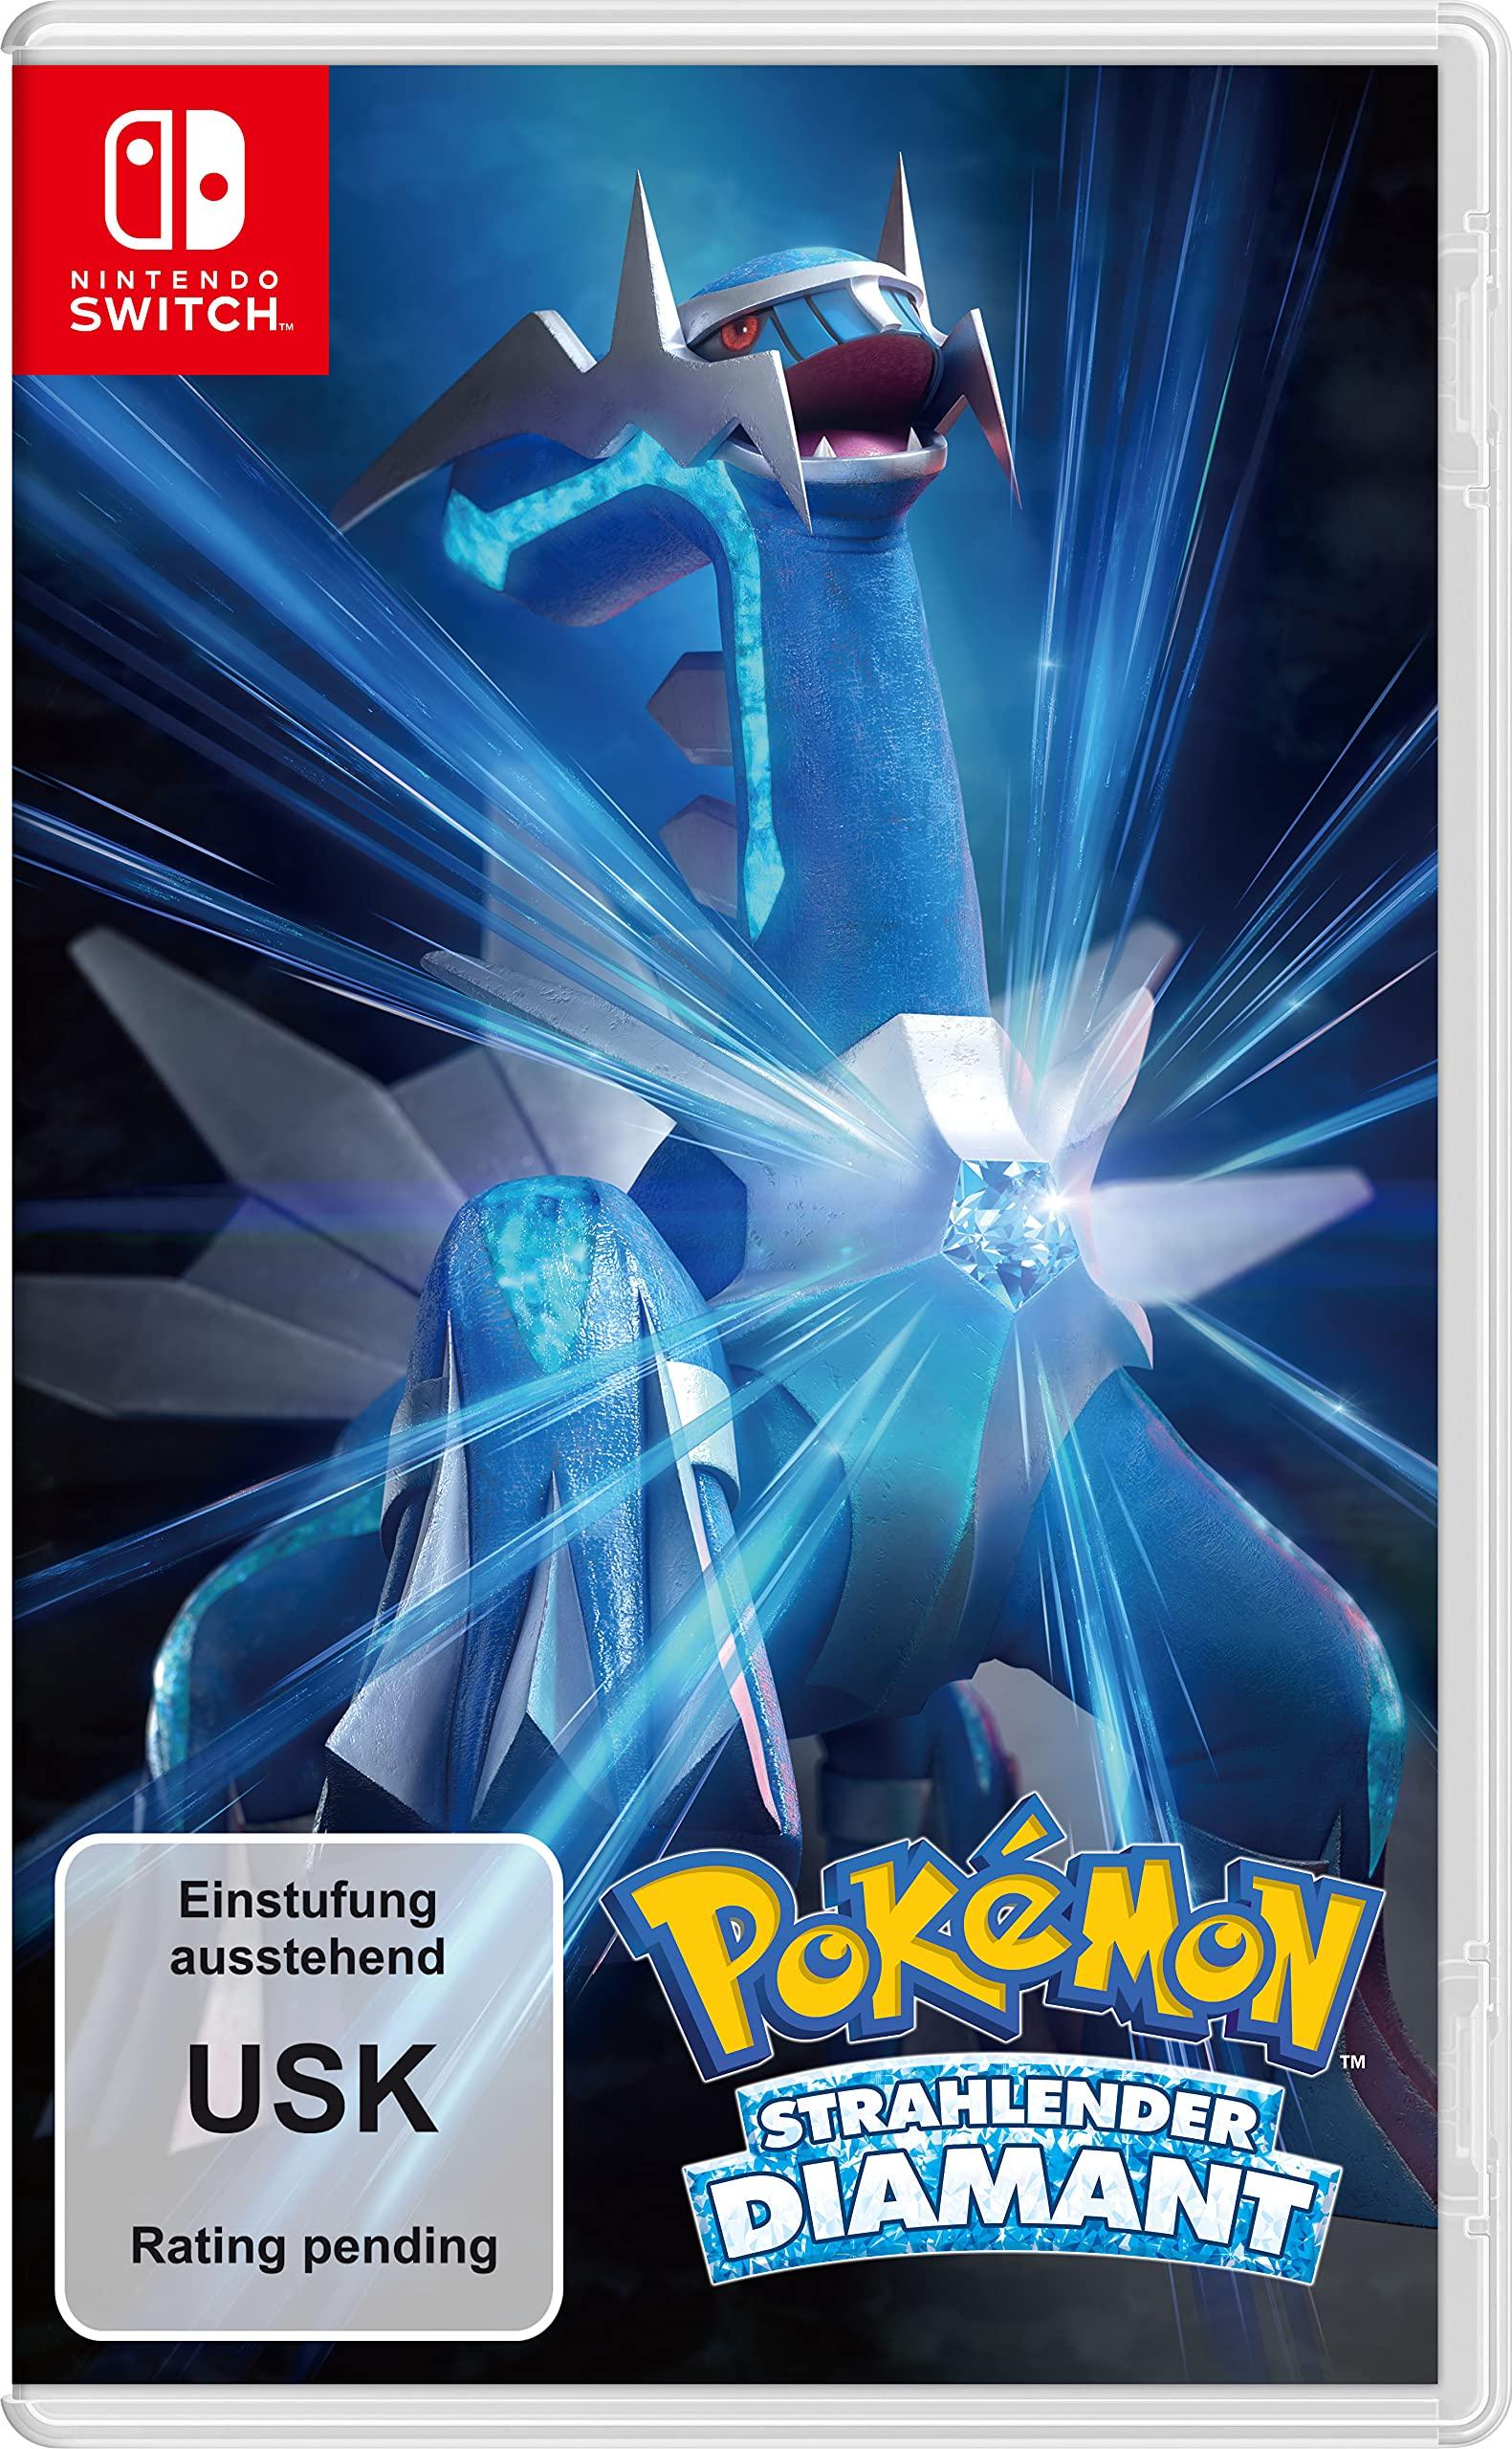 Pokémon Strahlender Diamant [Nintendo - Pokemon strahlender Diamant